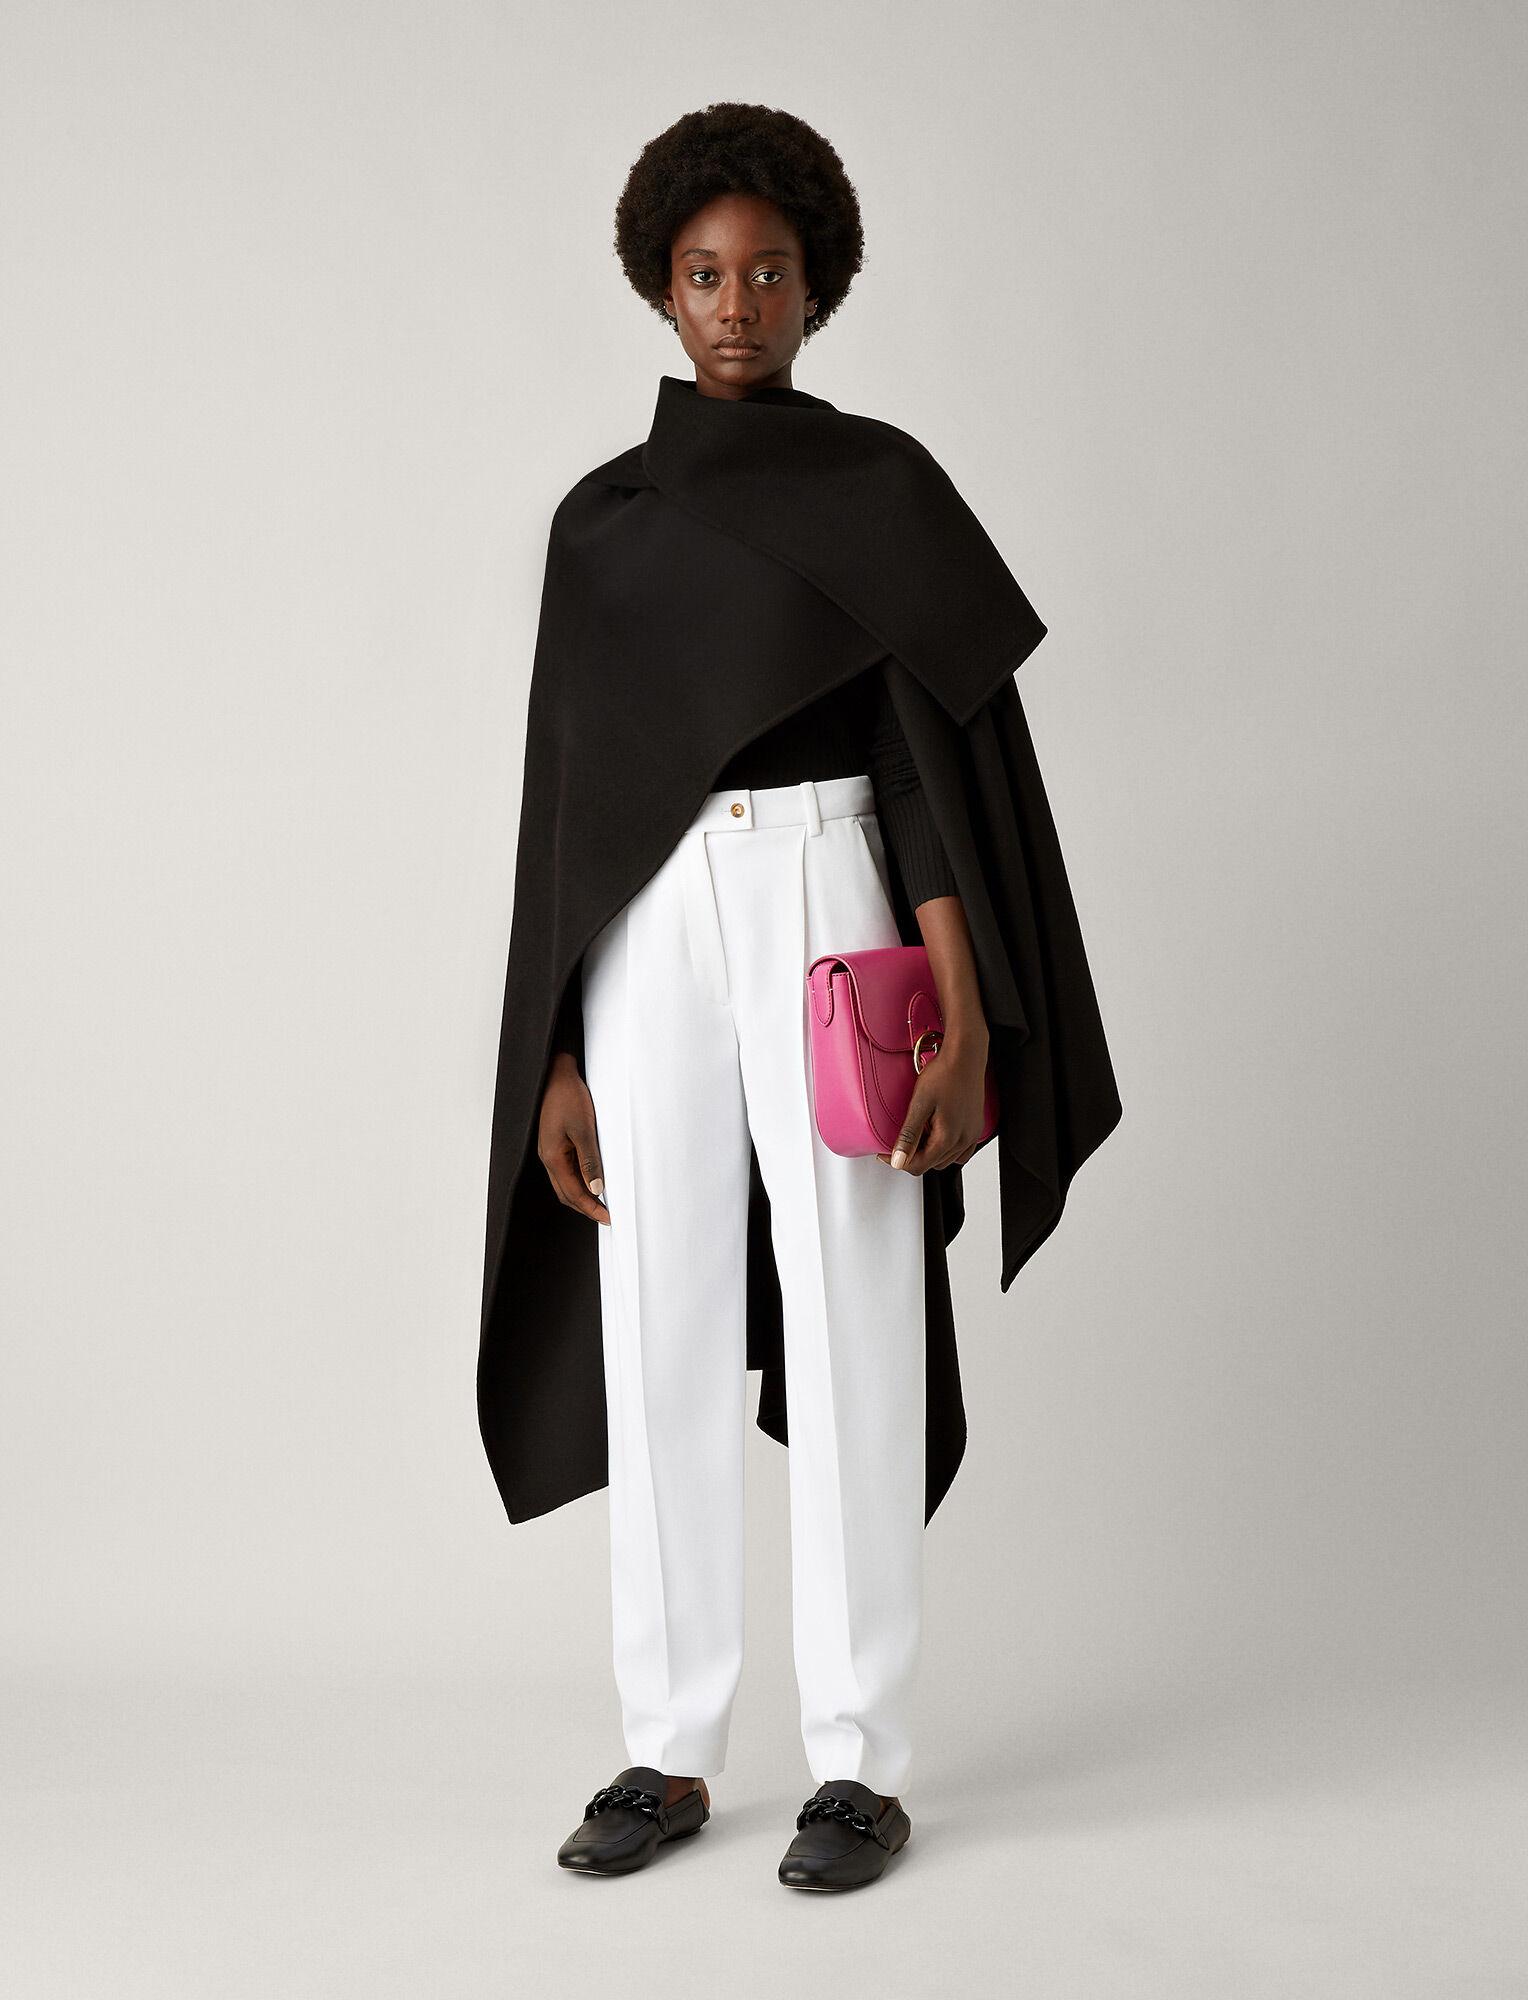 Joseph, Quadro Double Face Cashmere Coat, in BLACK